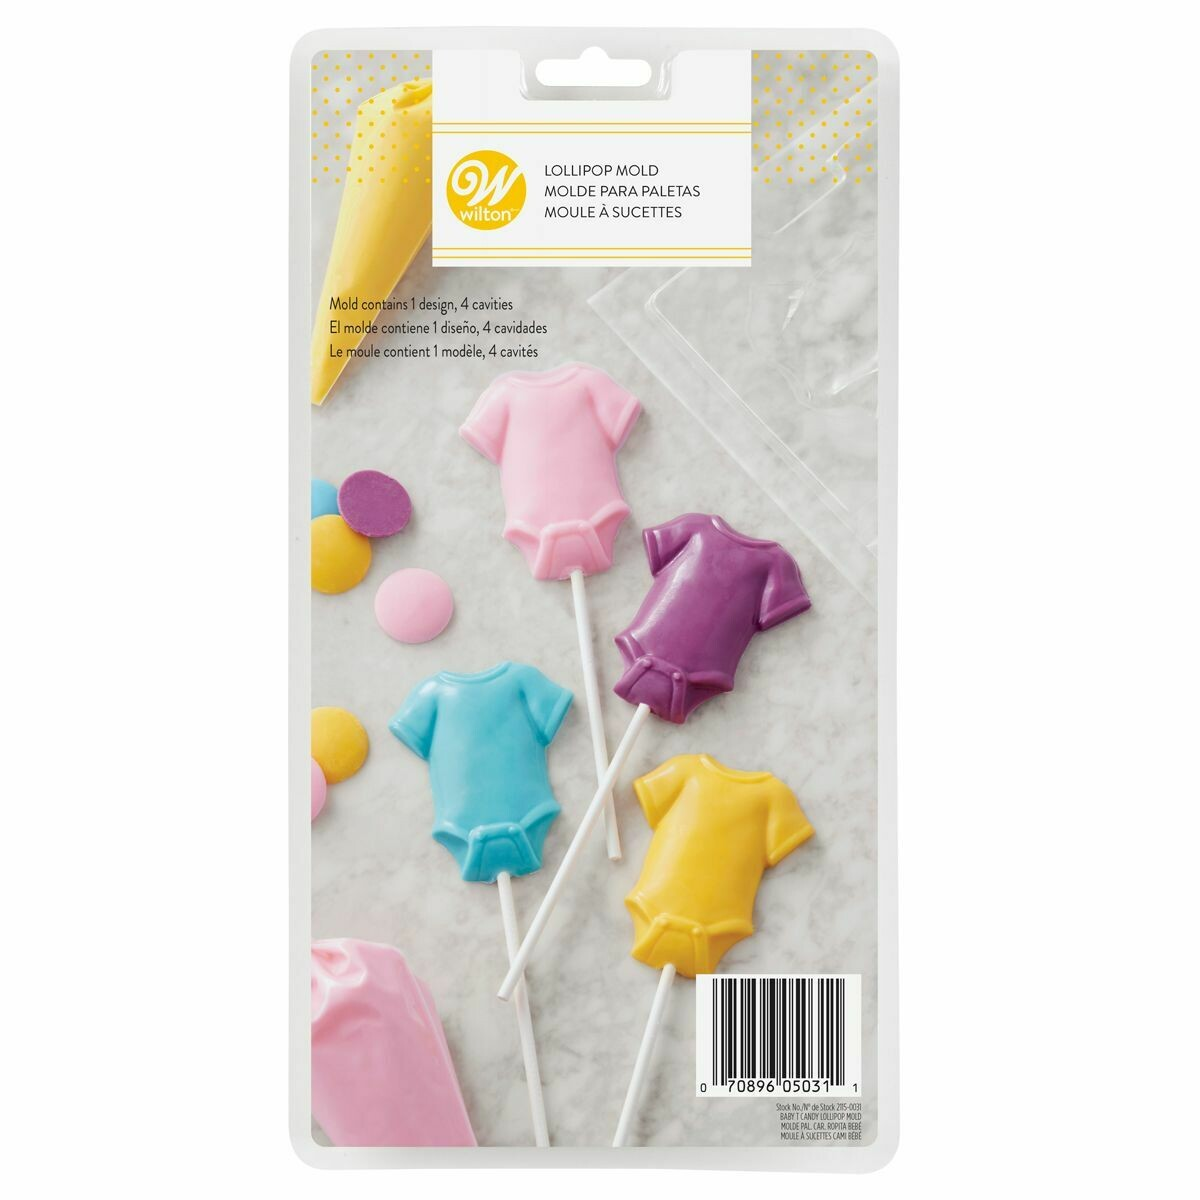 Wilton Lollipop Mould Baby Tee - Καλούπι για Γλειφιτζούρι Φορμάκι Μωρού